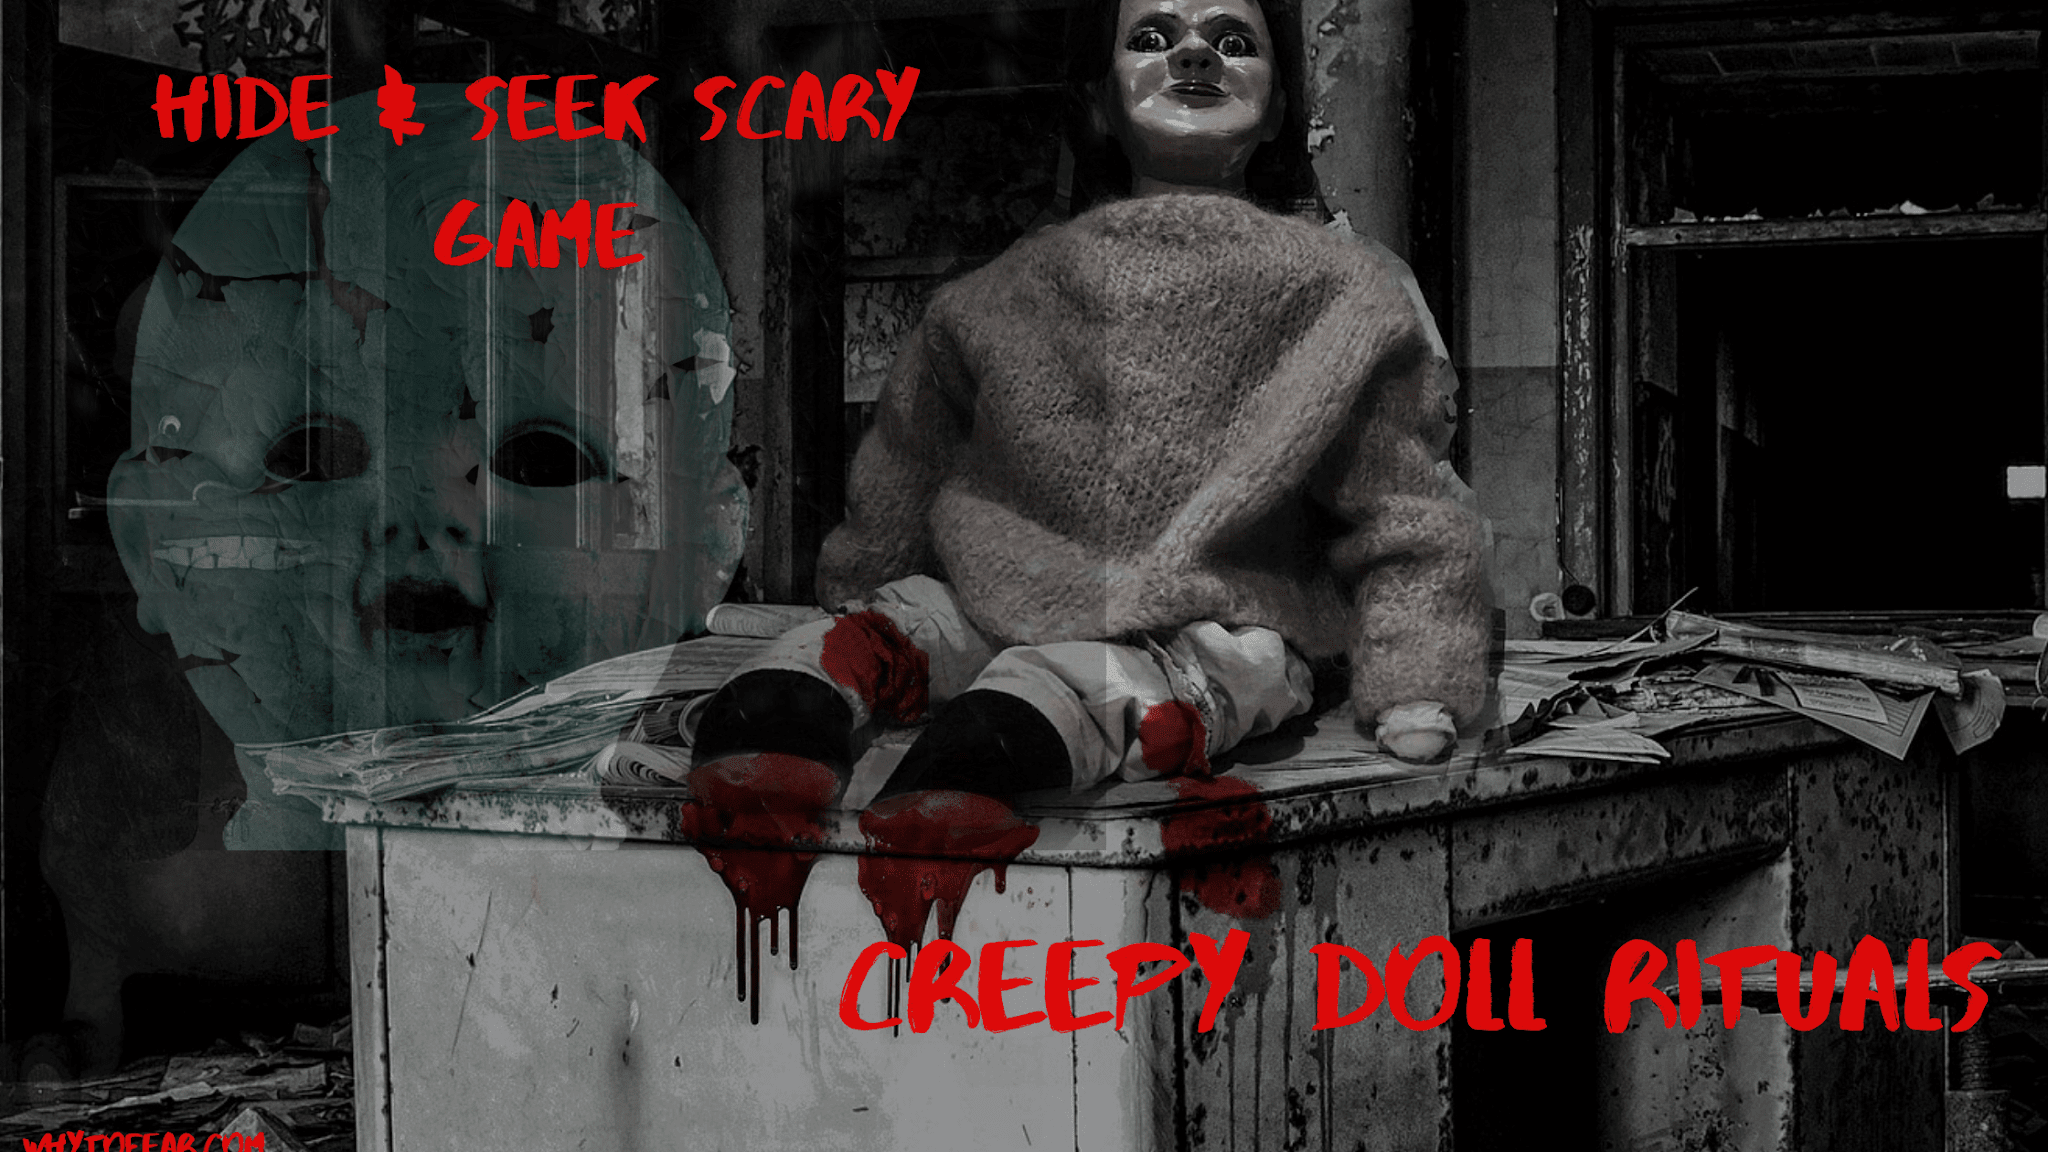 Creepy doll  ritual-Scary hide & seek game